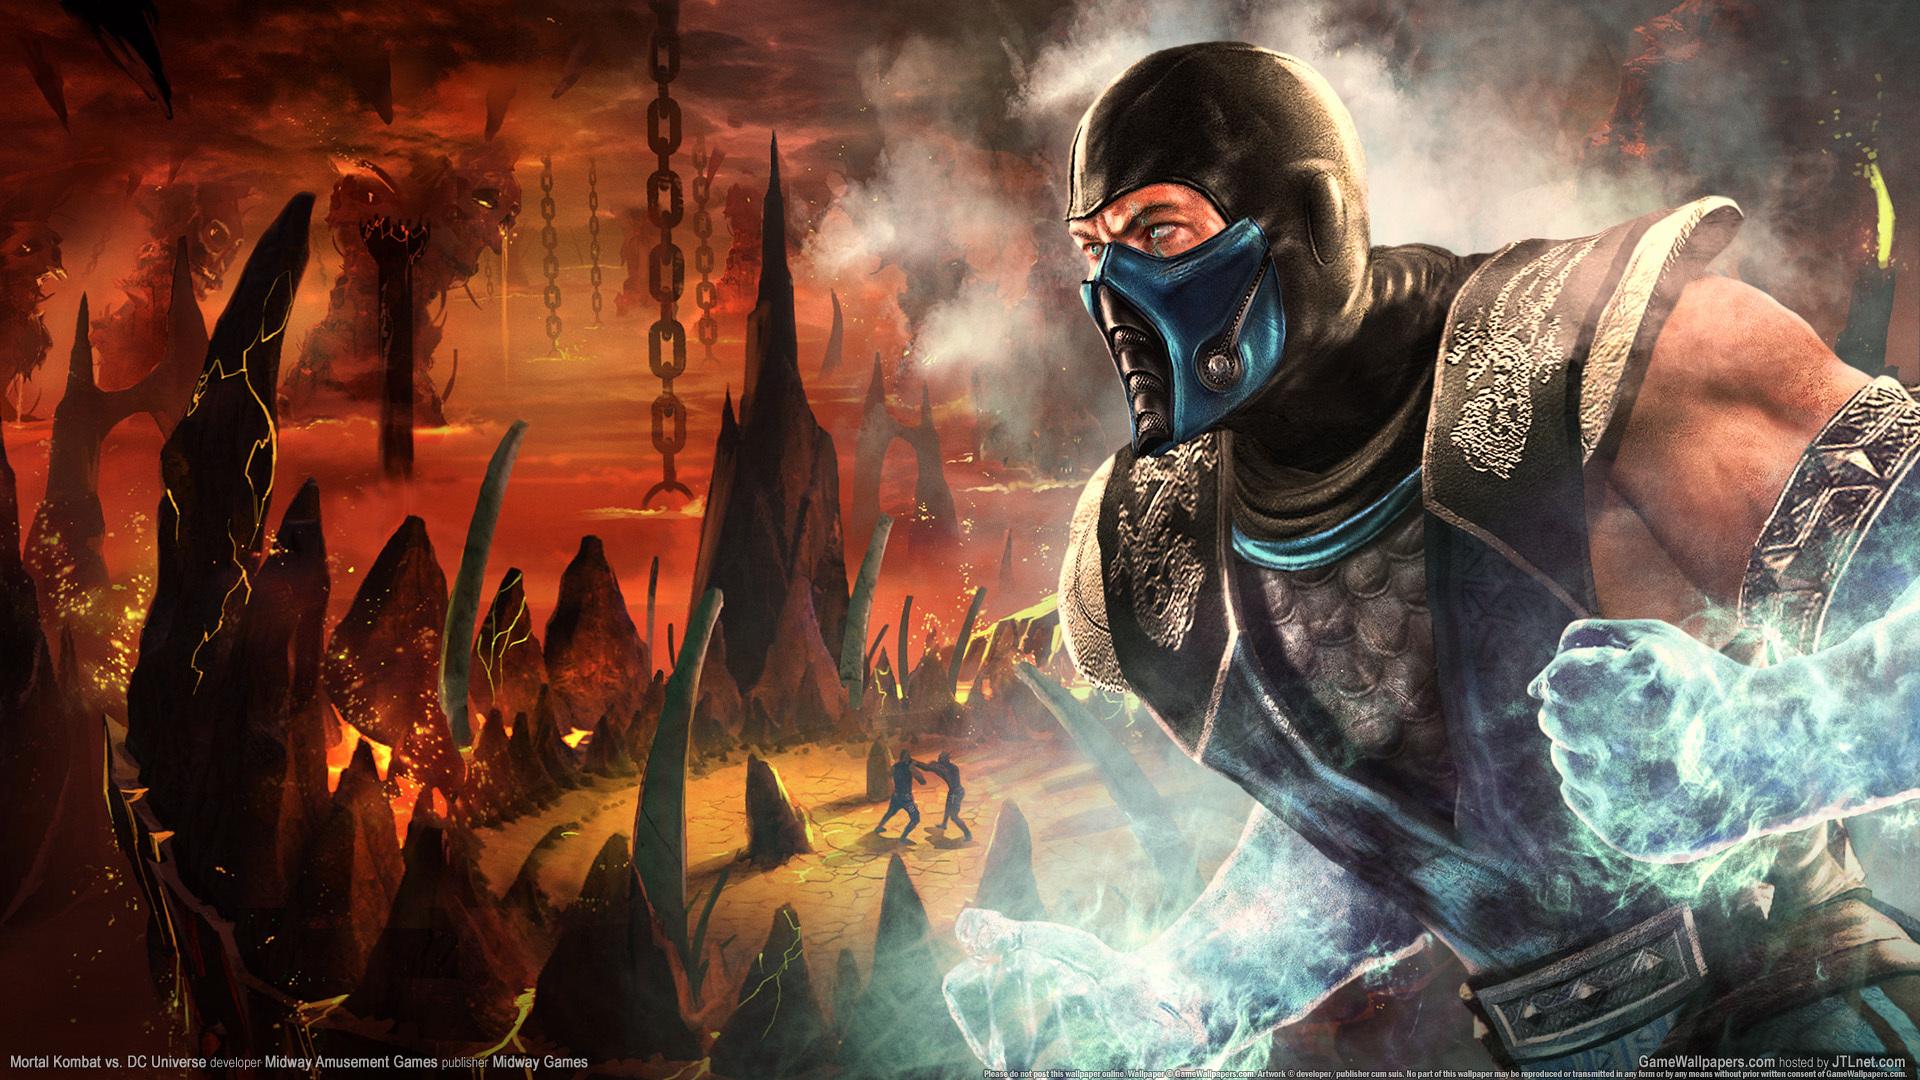 14301 Screensavers and Wallpapers Mortal Kombat for phone. Download Games, Mortal Kombat pictures for free